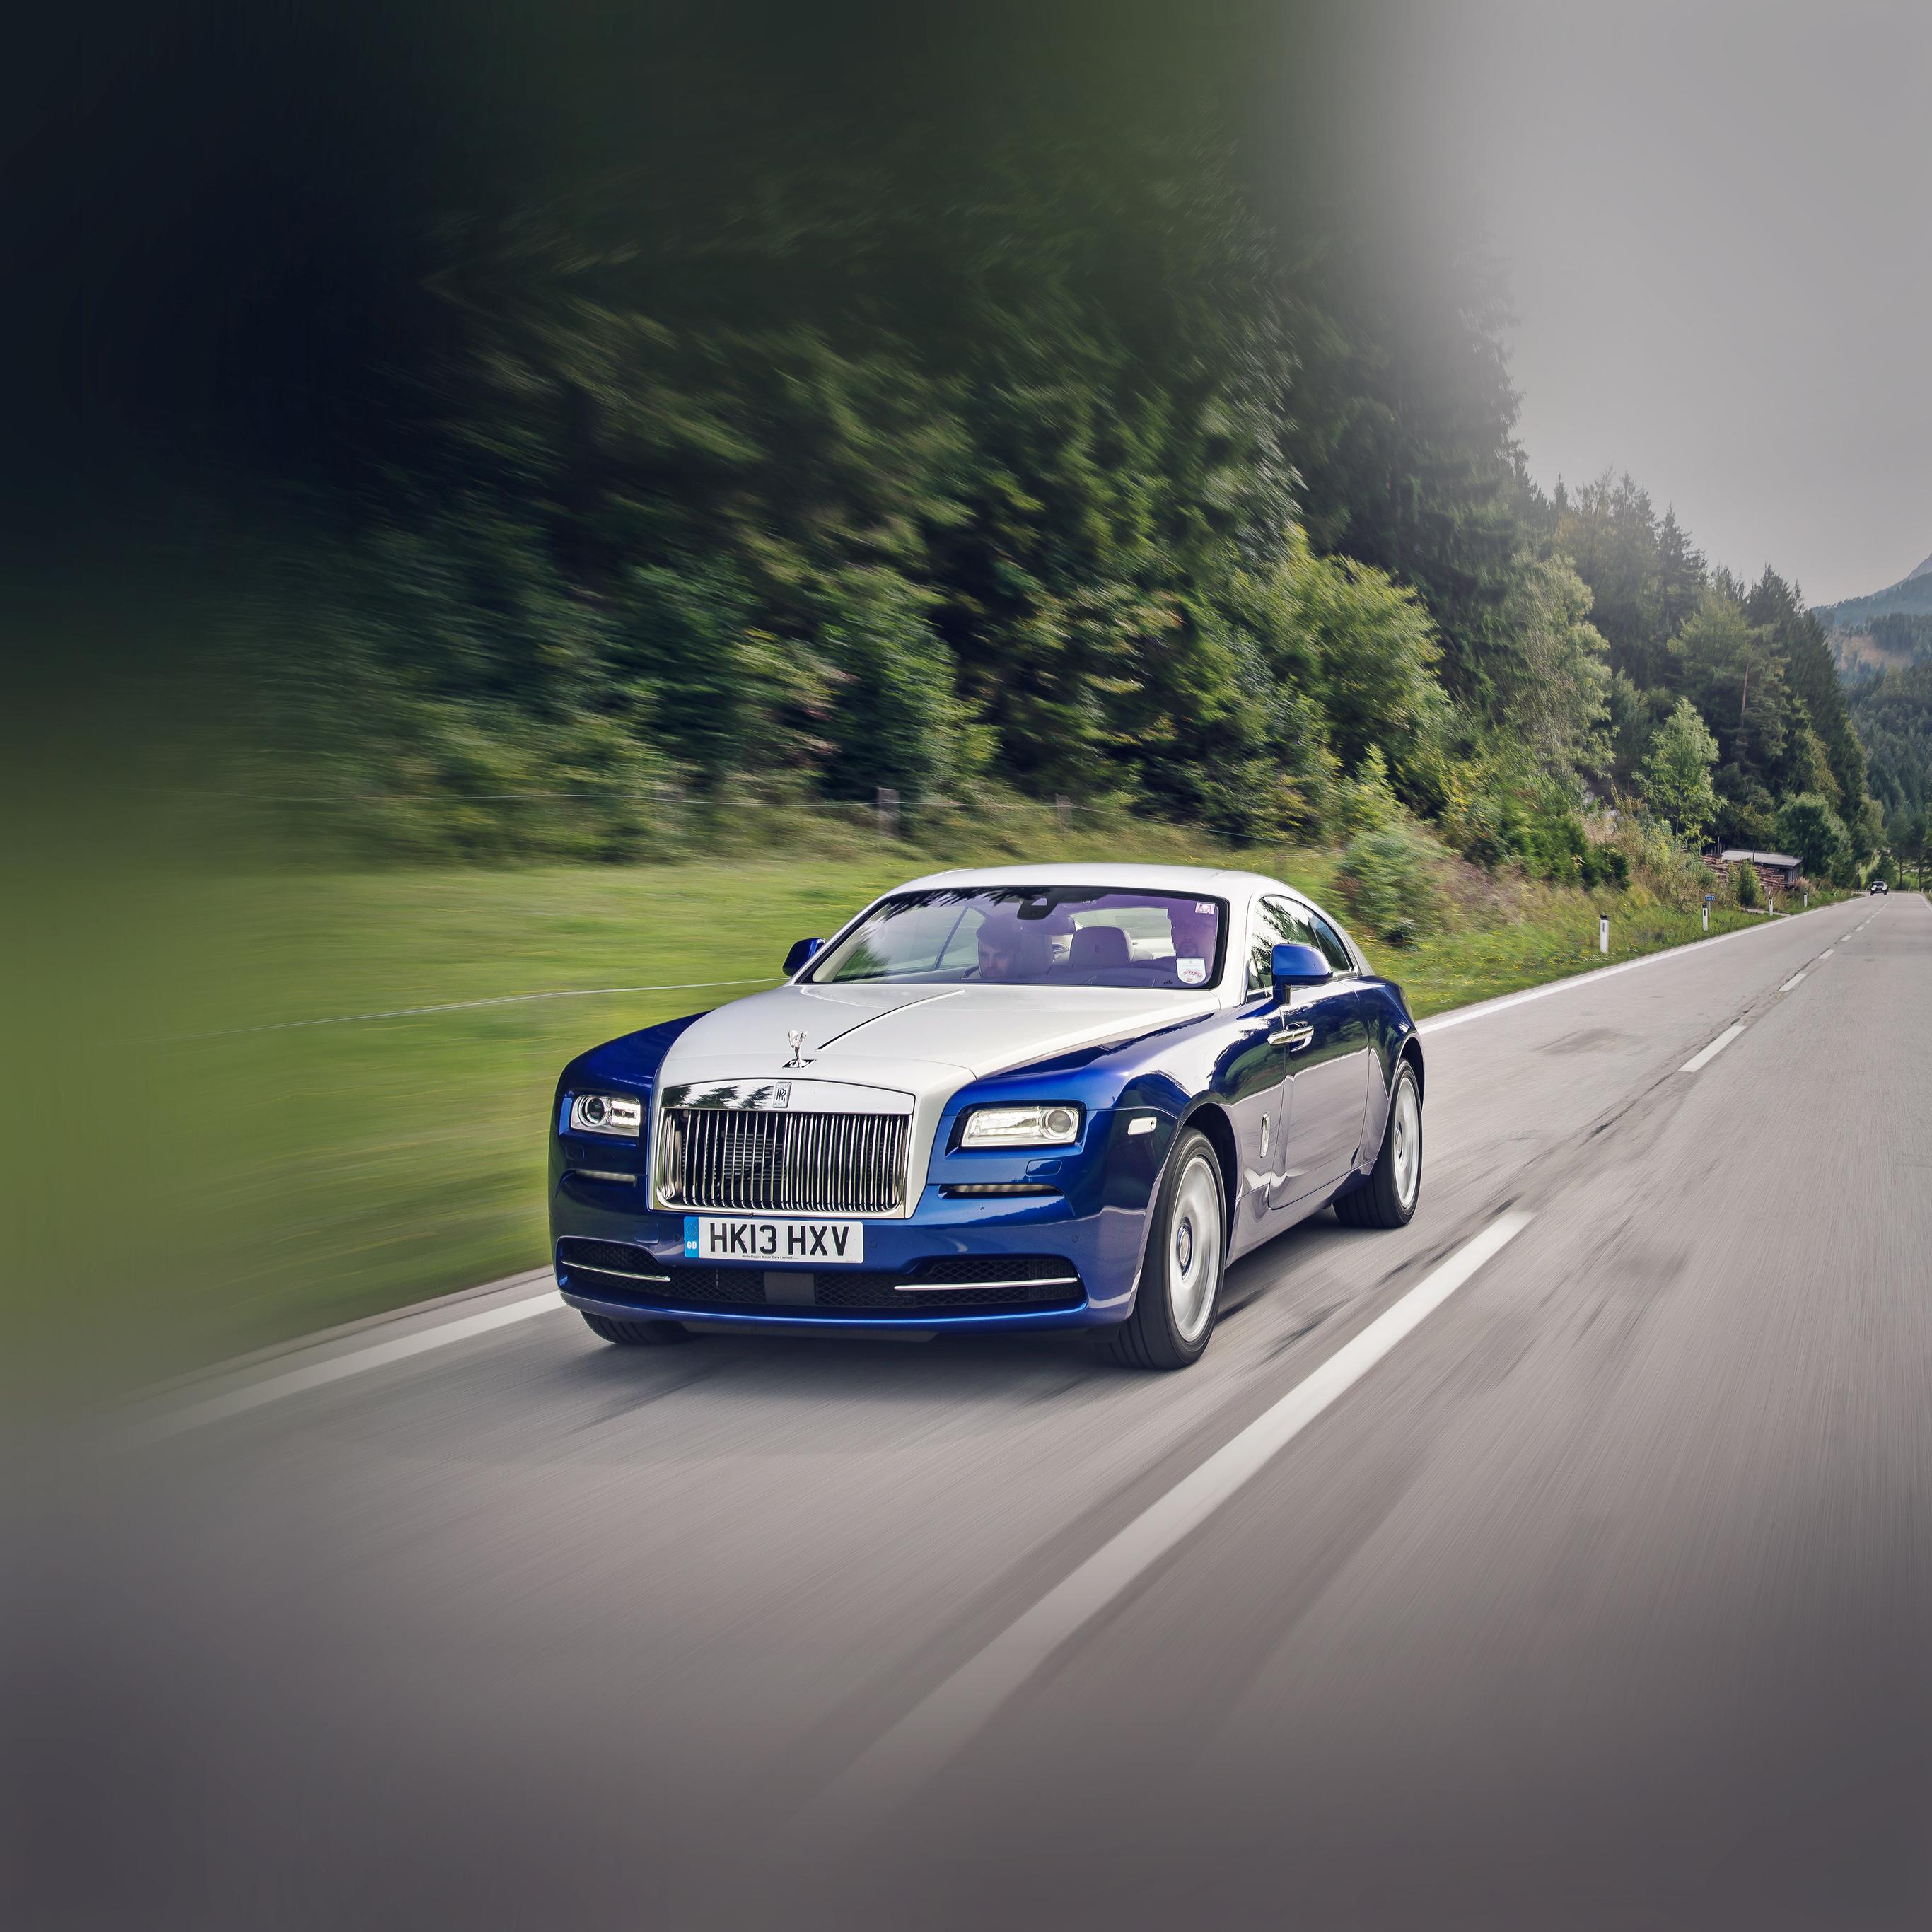 ... Wallpaper Source · Aj95 Bentley Blue Drive Car